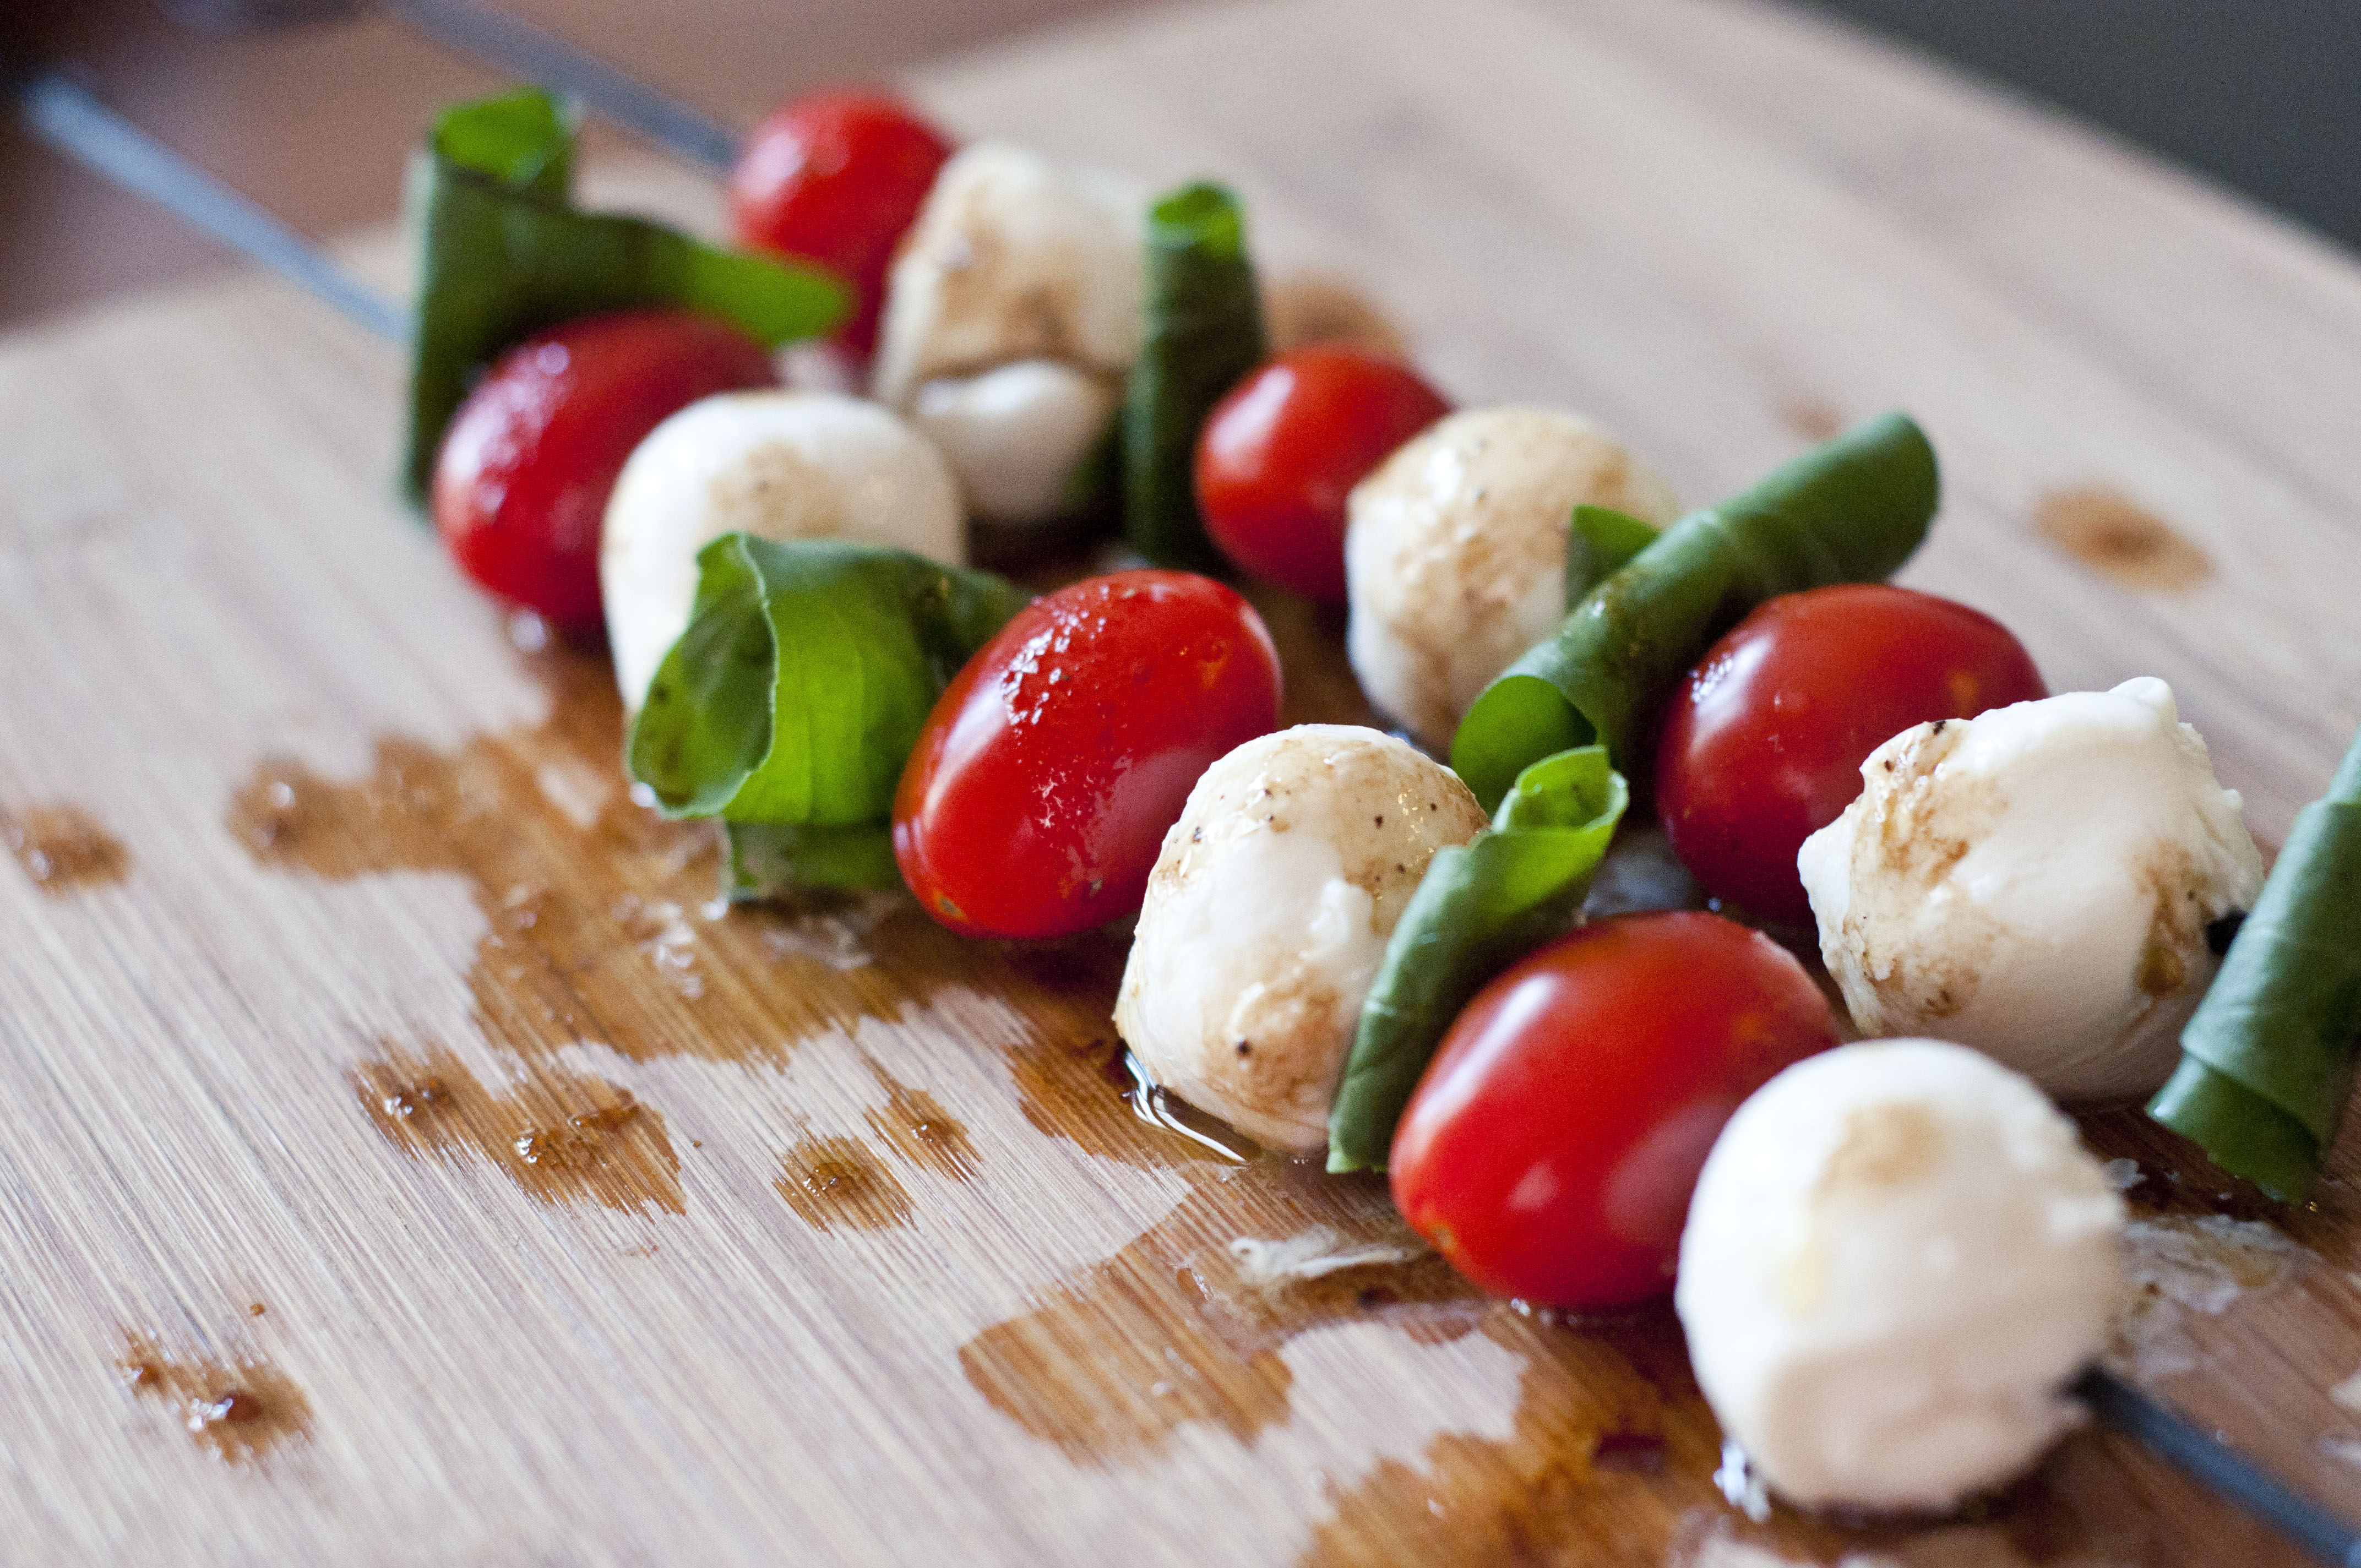 caprese salad recipe, skewer recipe, basil recipe, tomato recipe, mozzarella recipe, caprese salad skewer recipe, caprese skewers recipe, summer recipe, easy salad recipe, easy caprese recipe, easy recipe, food, cooking, recipes, taste arkansas